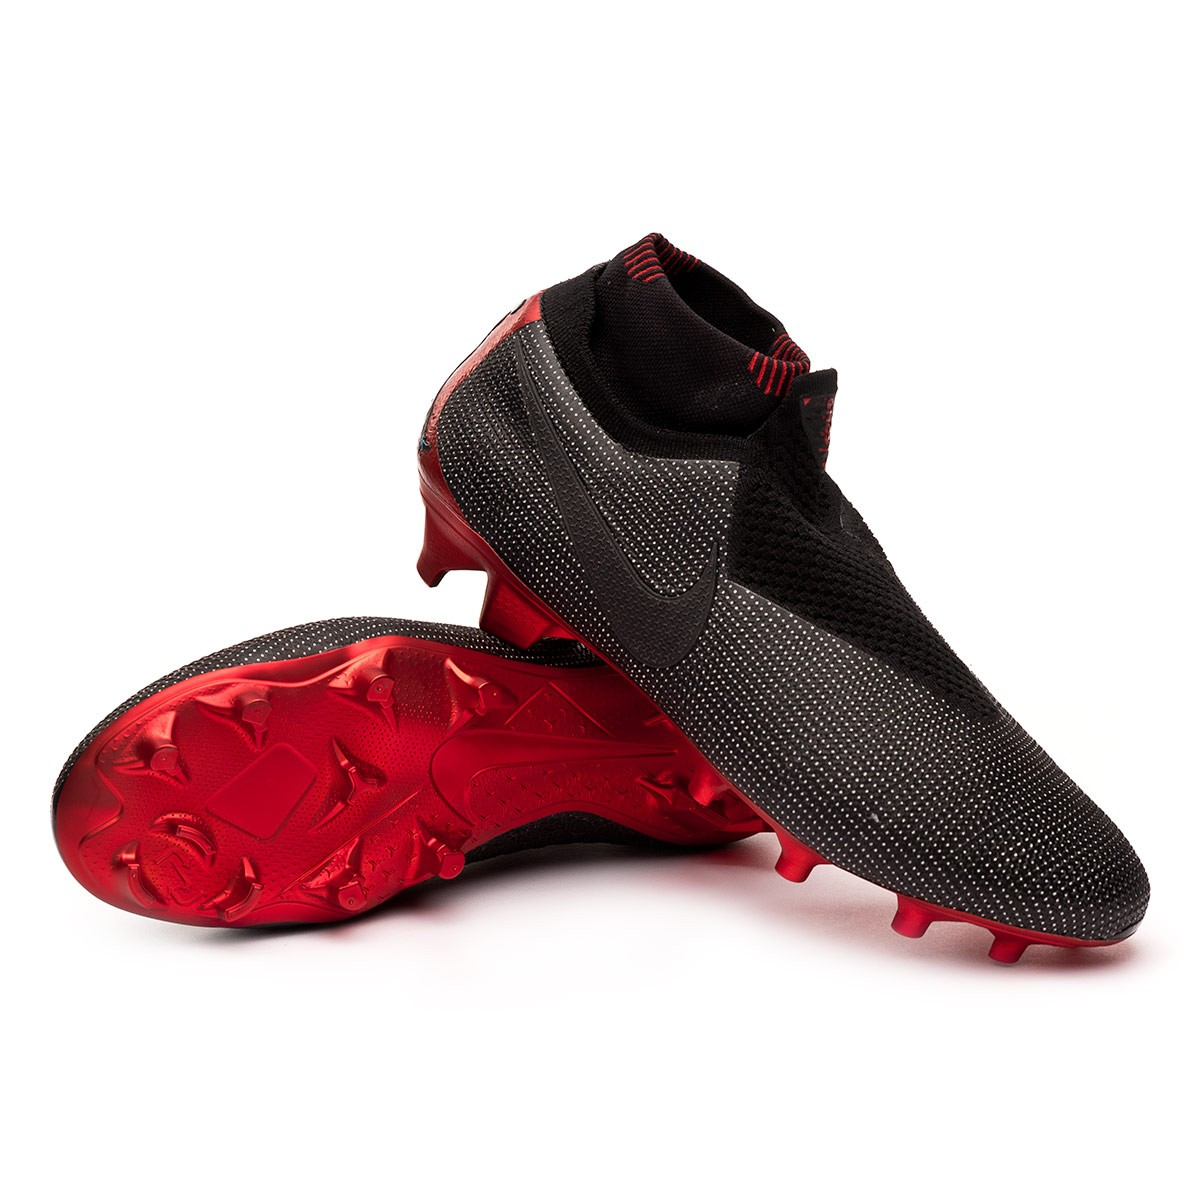 d4d383482 Football Boots Nike Phantom Vision Elite DF SE Jordan x PSG FG Black -  Tienda de fútbol Fútbol Emotion